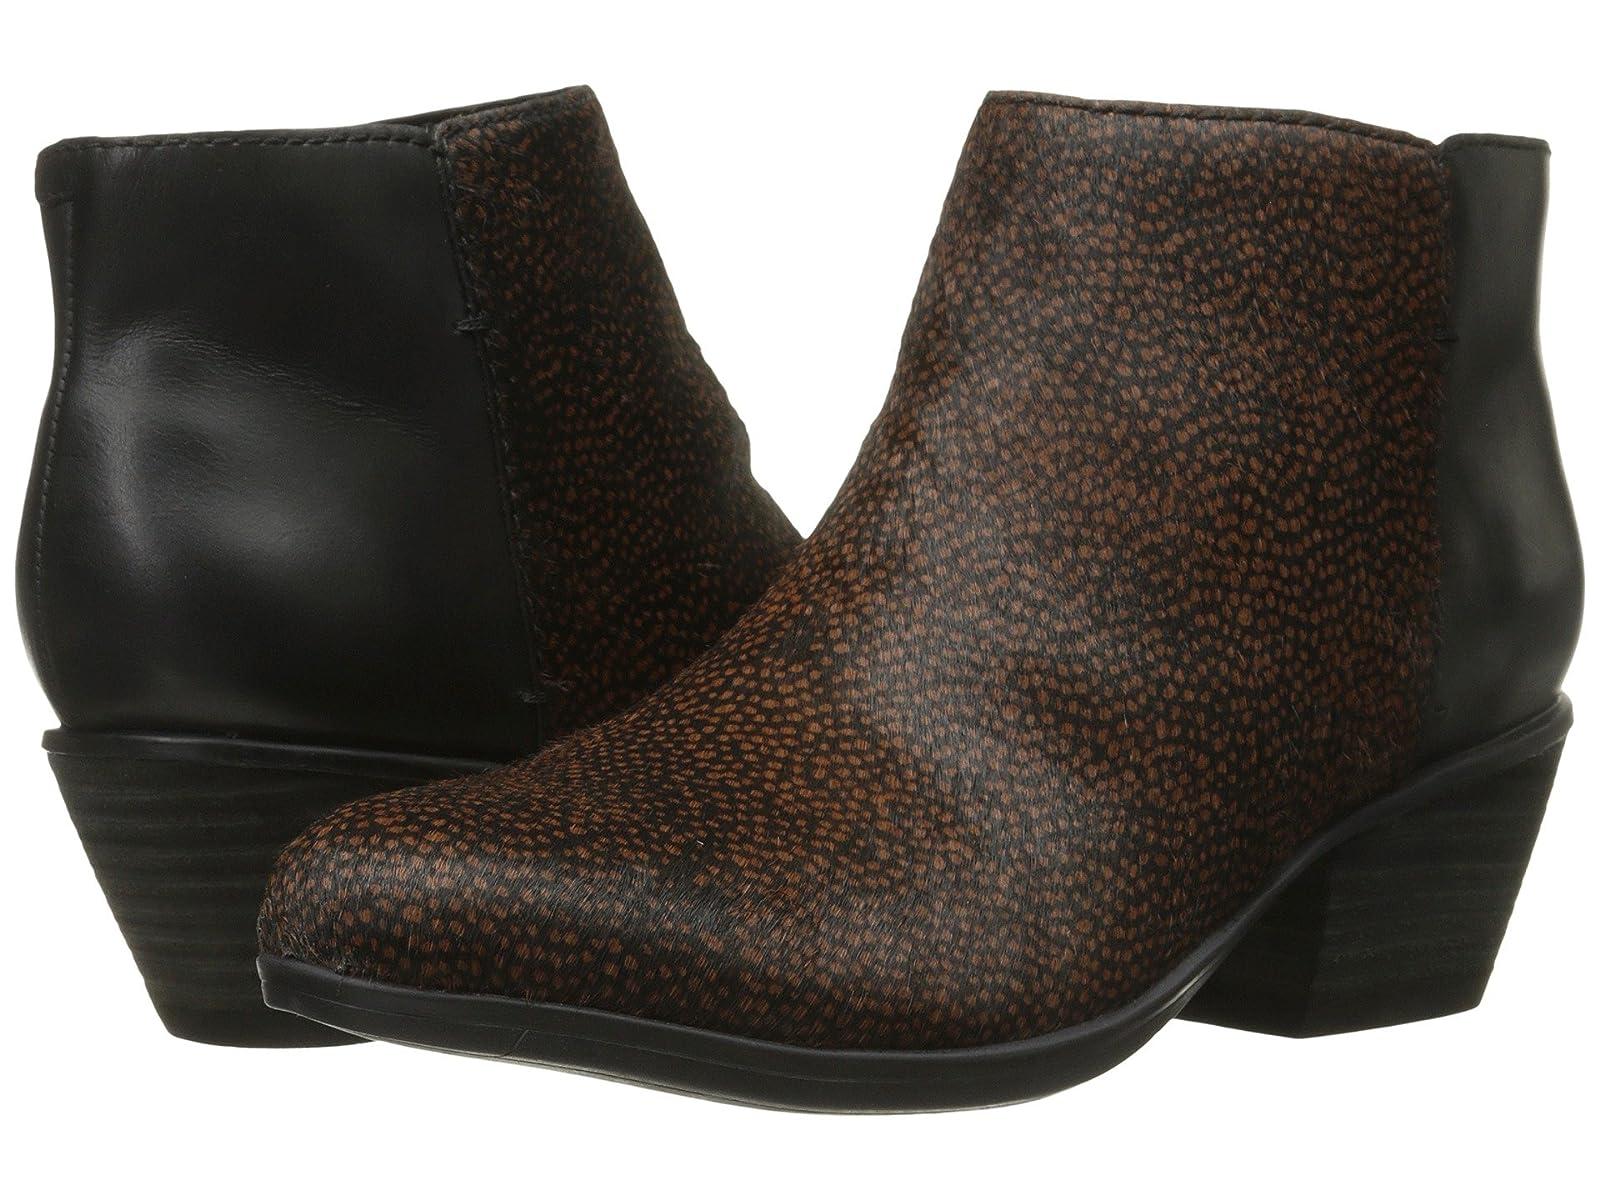 Clarks Gelata ItaliaCheap and distinctive eye-catching shoes